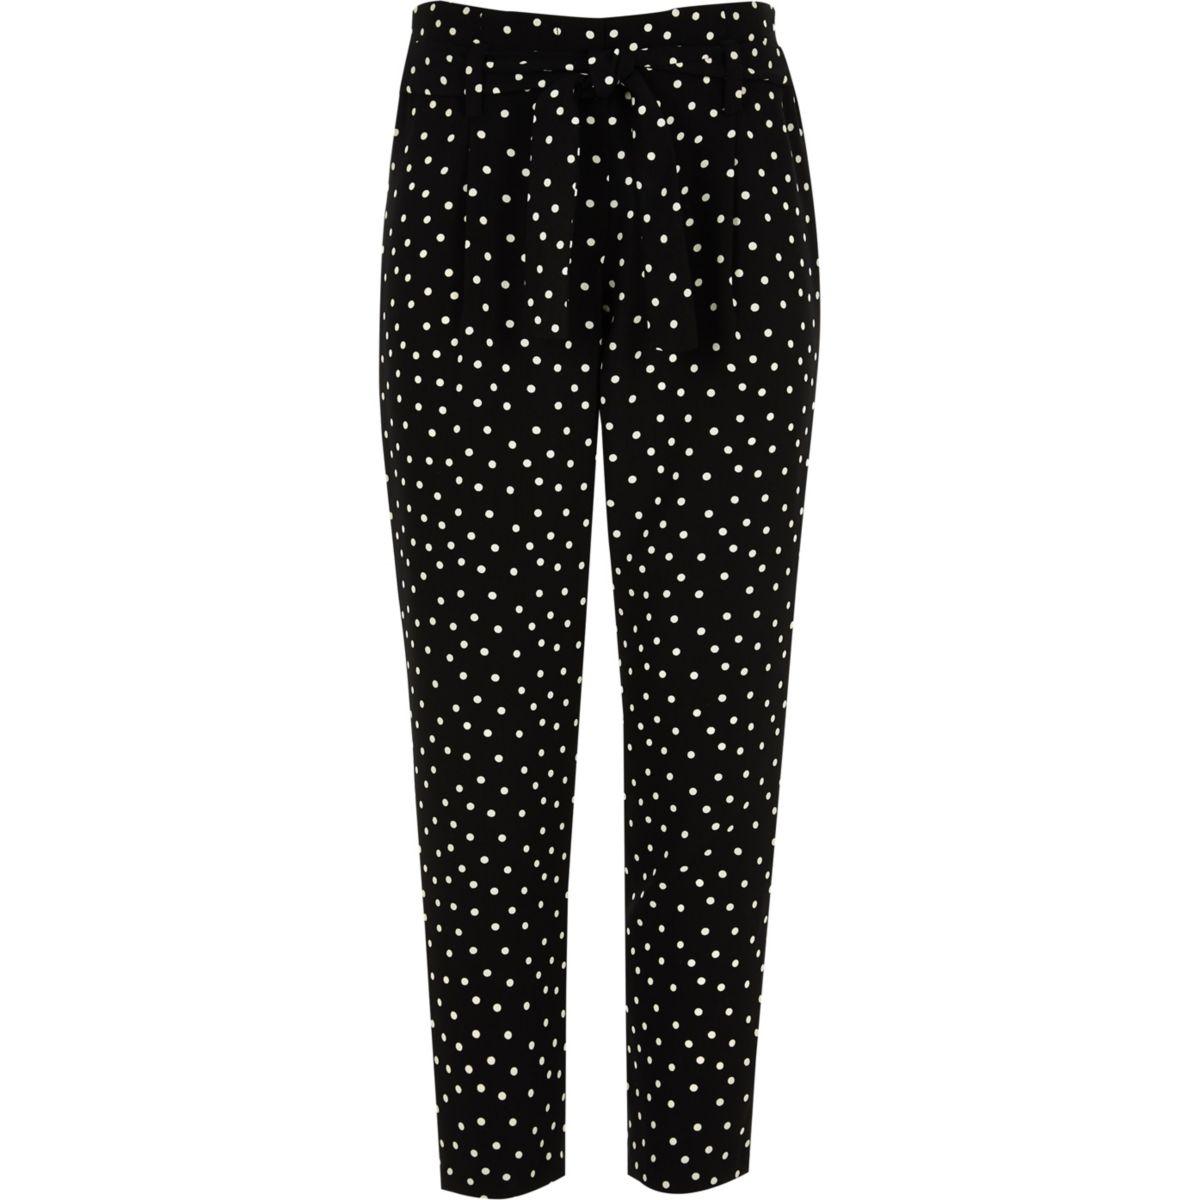 Girls black polka dot tapered pants